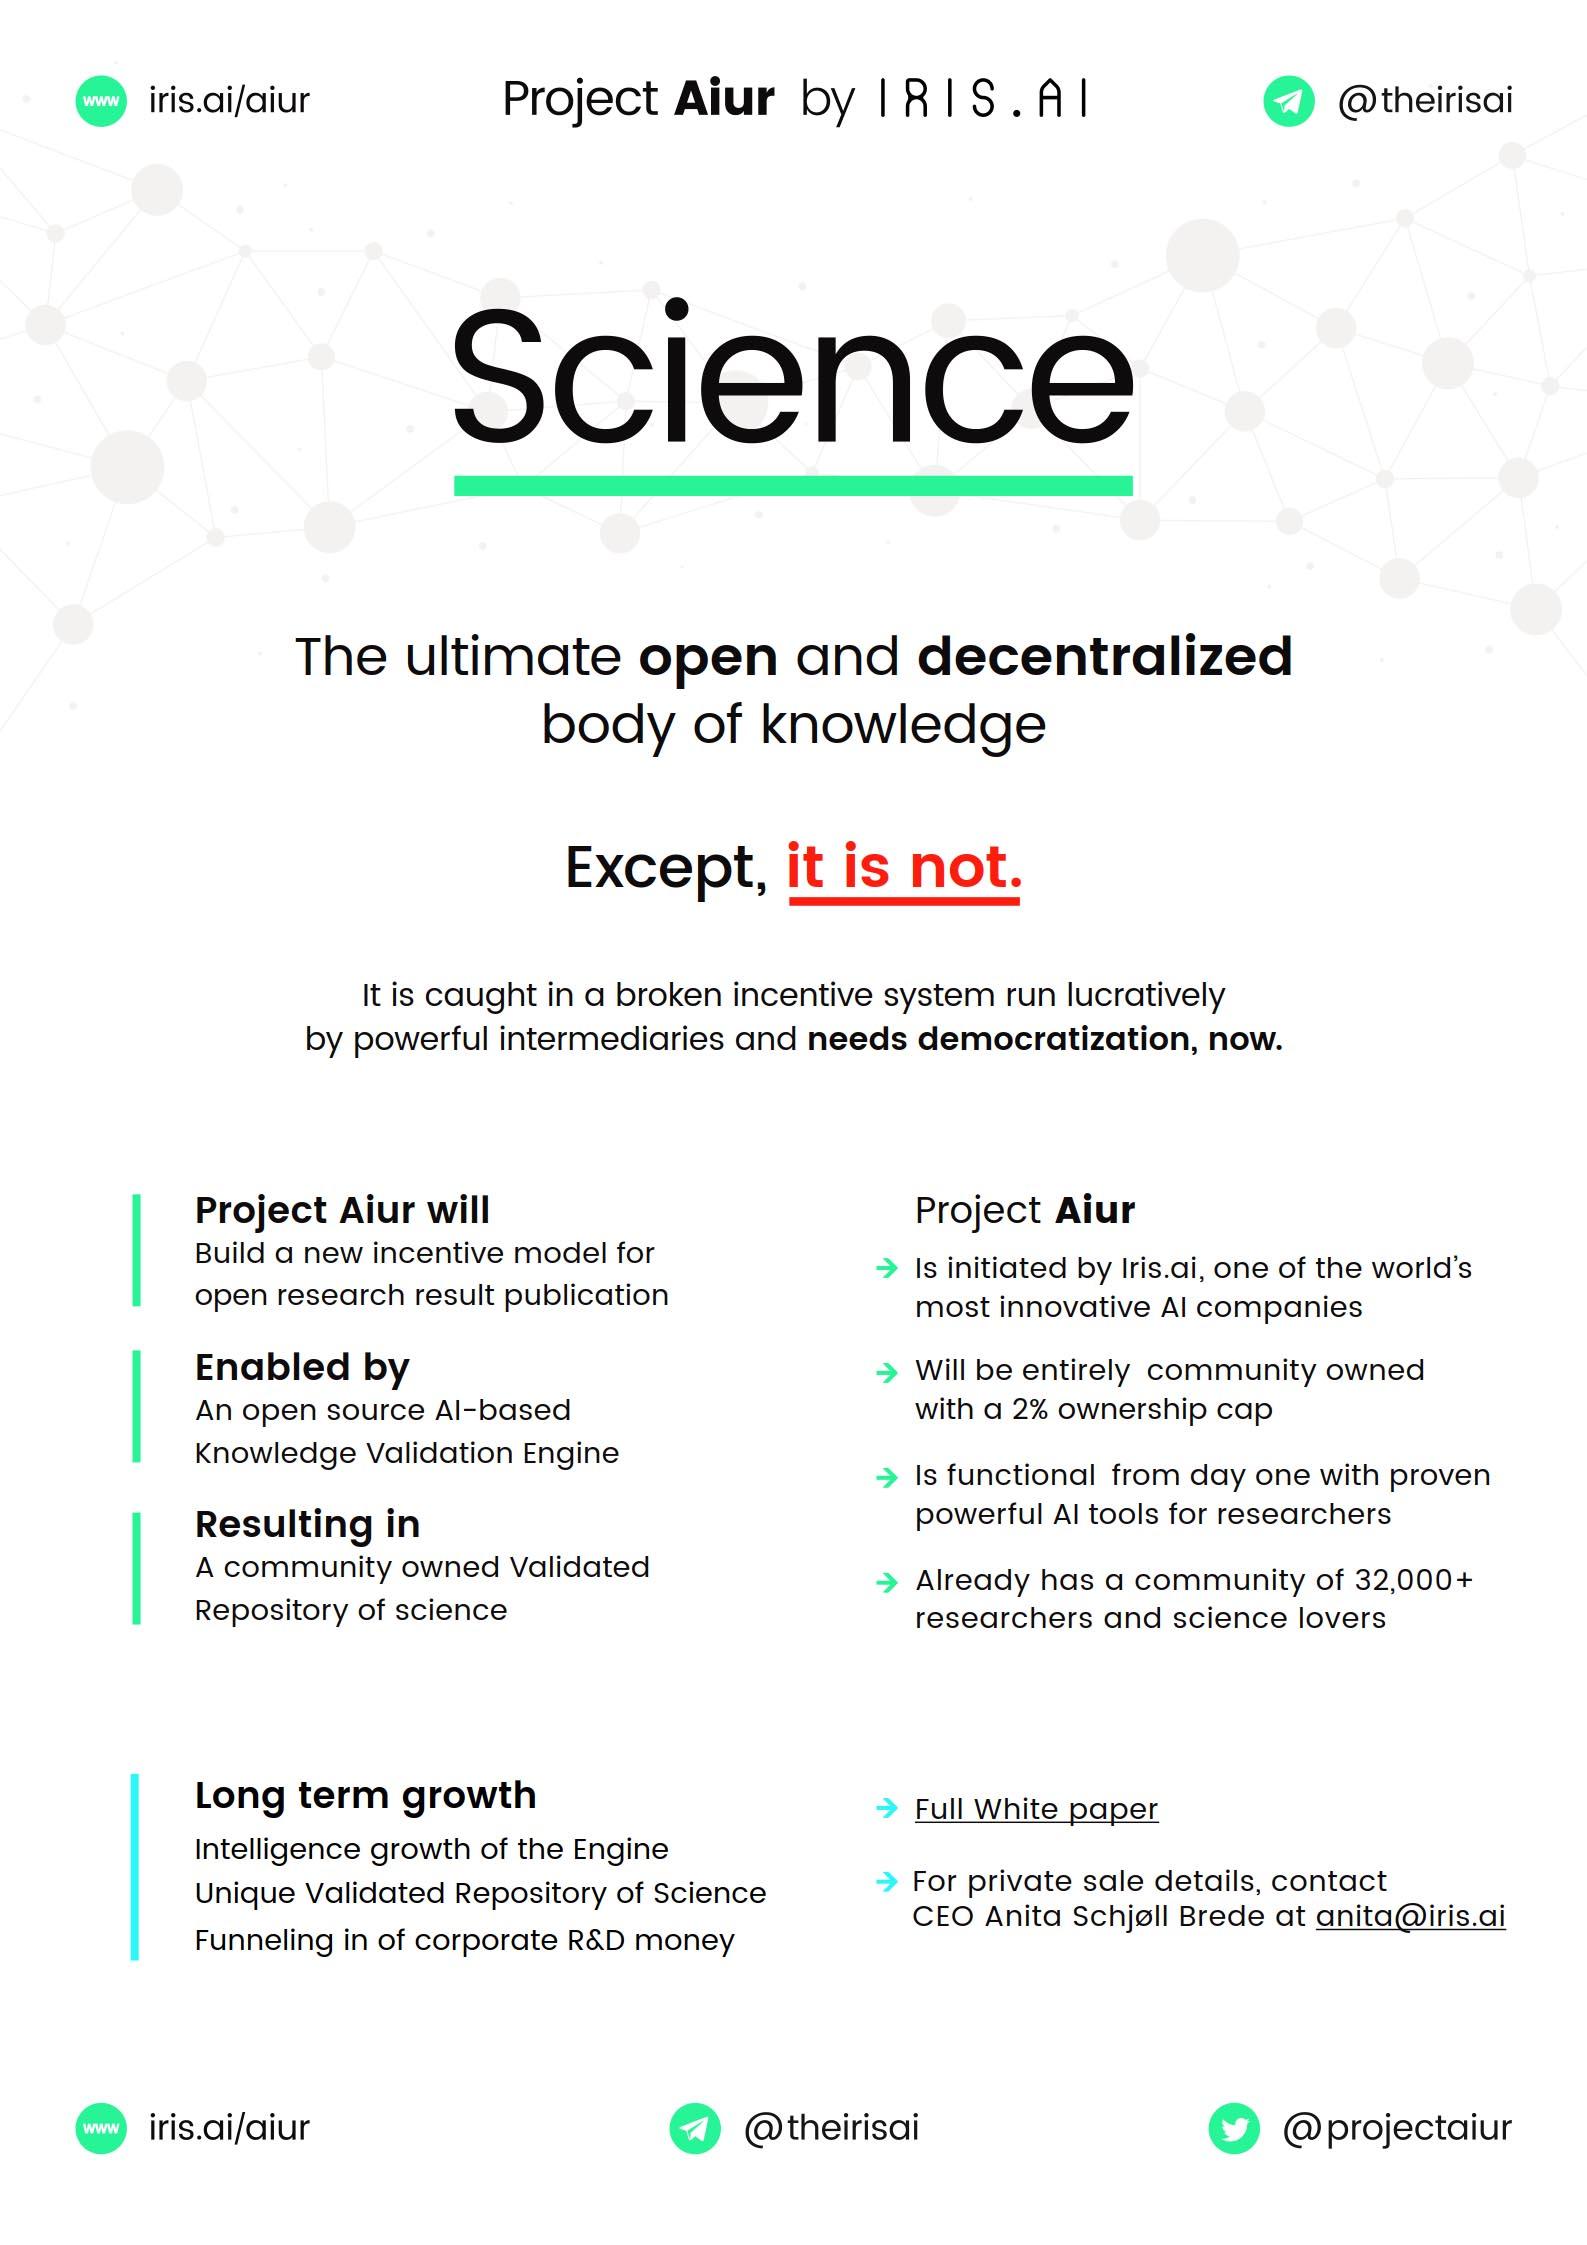 Iris.ai & Project AIUR: Open Science, Blockchain, Artificial Intelligence